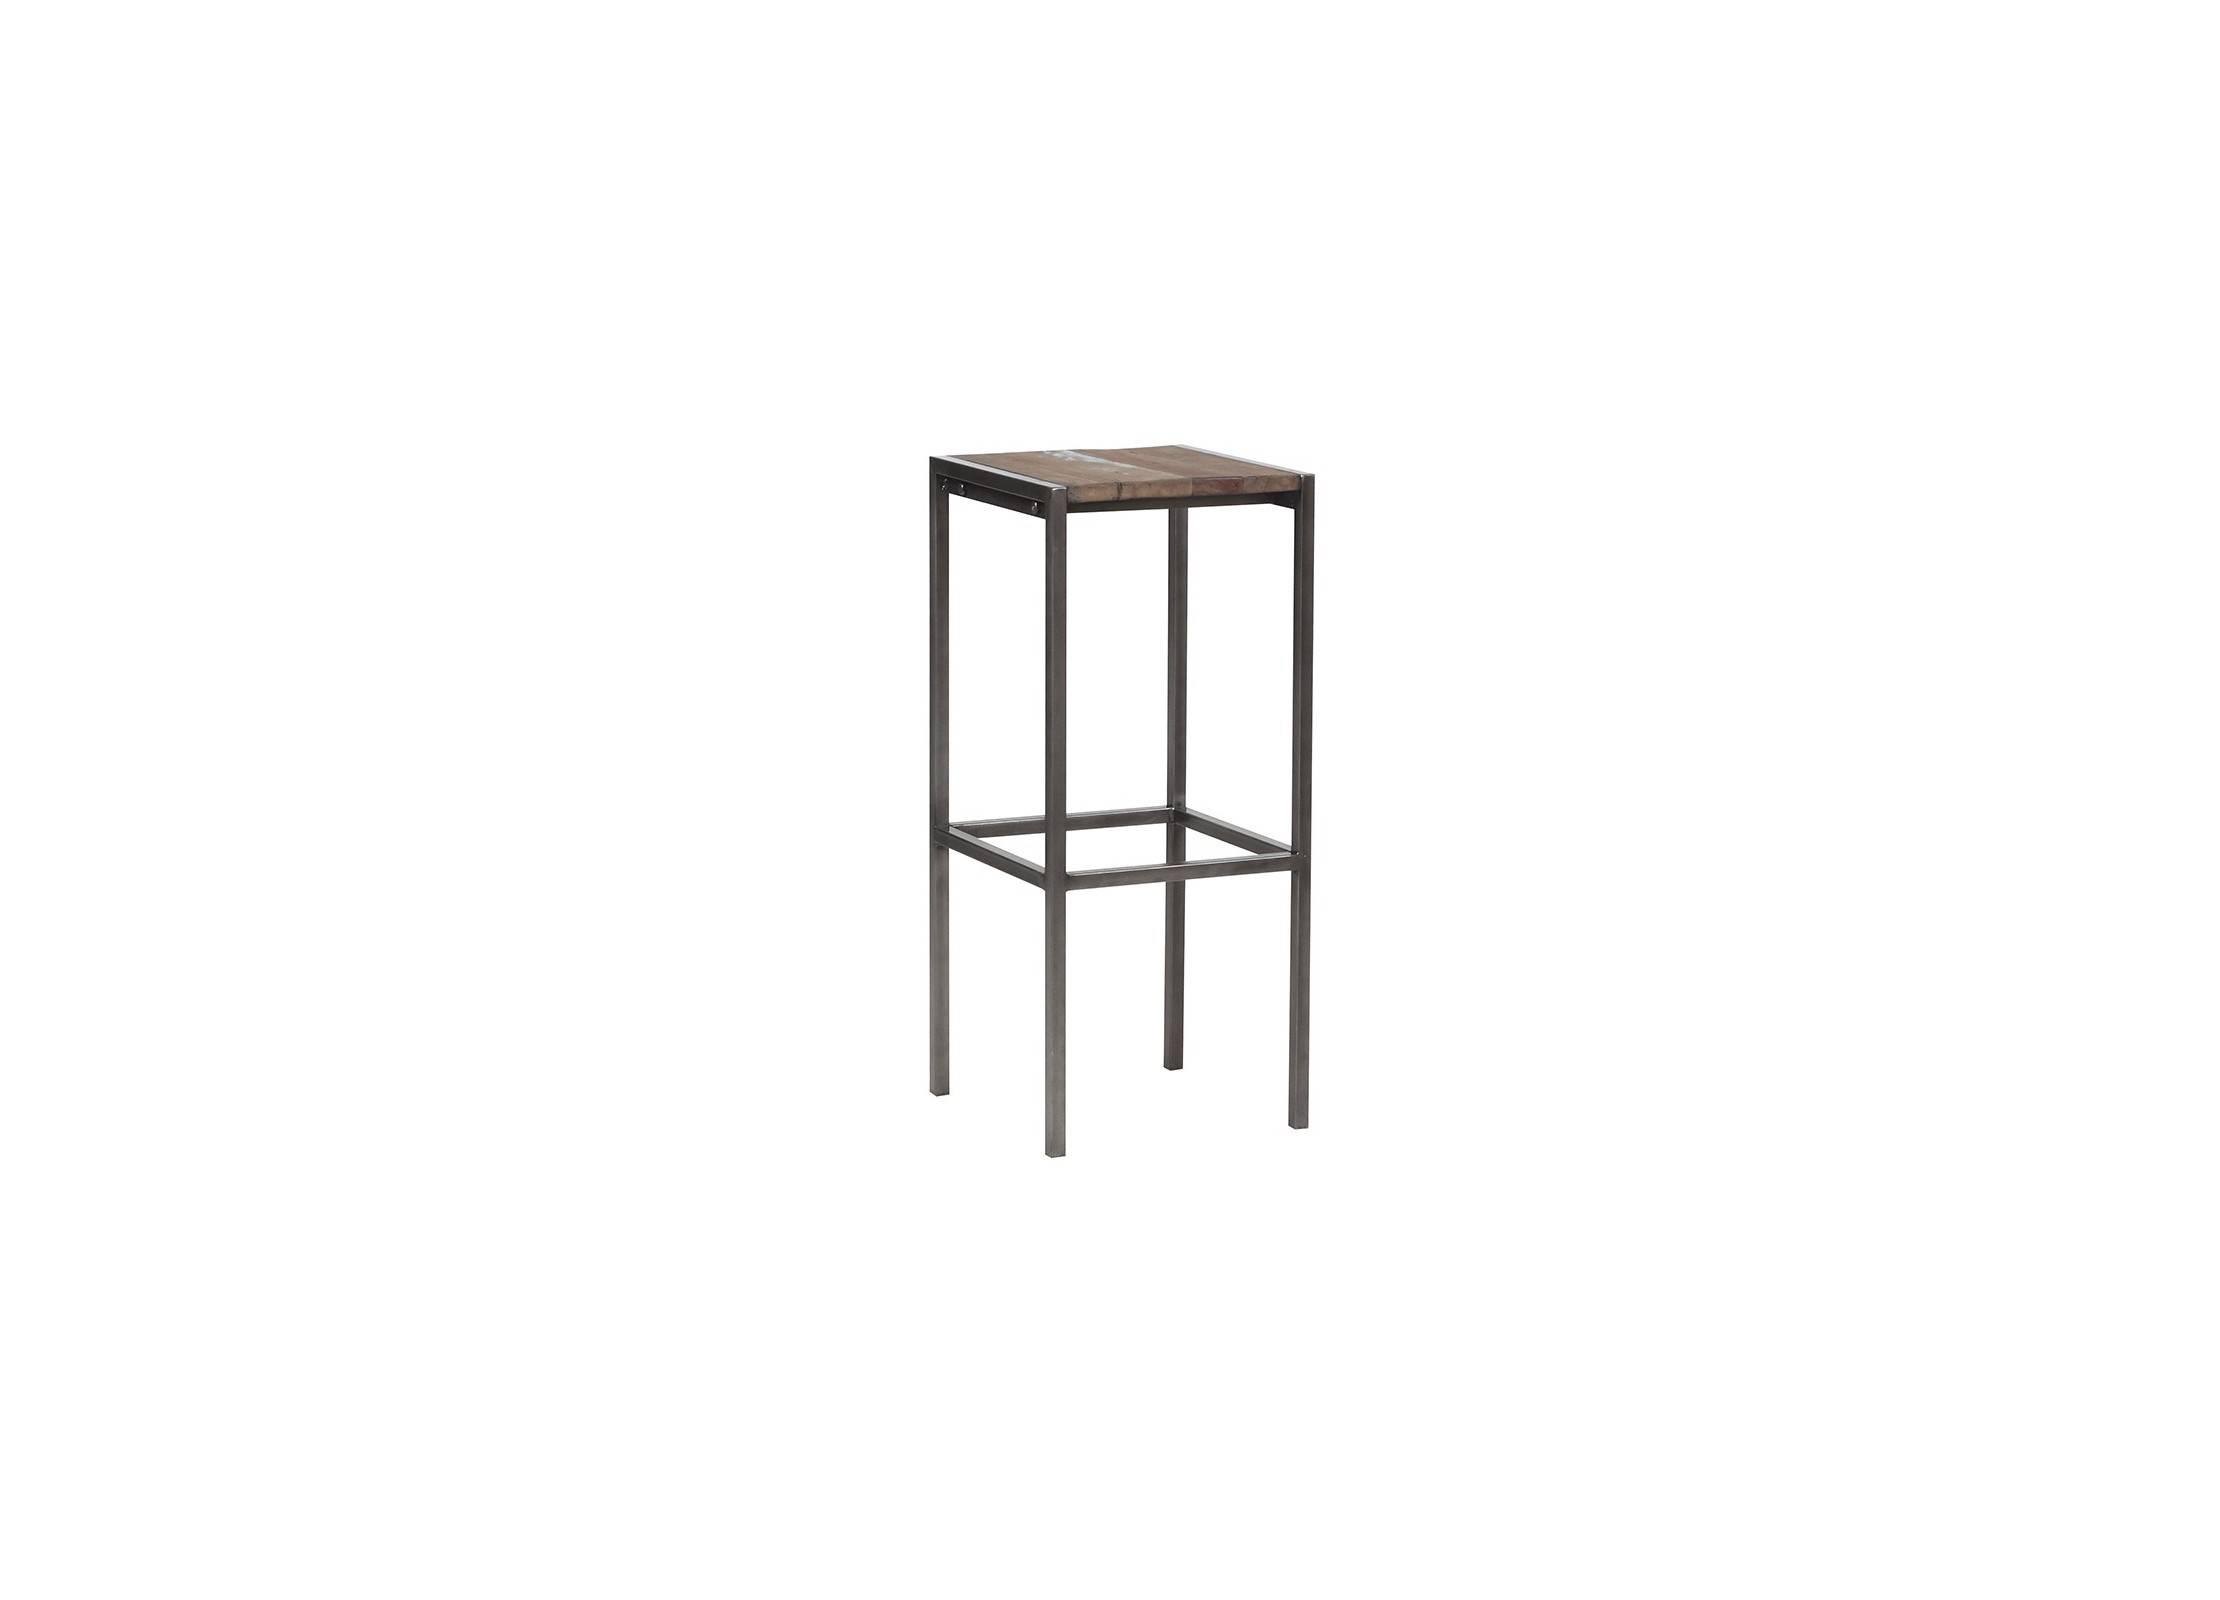 tabouret de bar edito l80cm. Black Bedroom Furniture Sets. Home Design Ideas